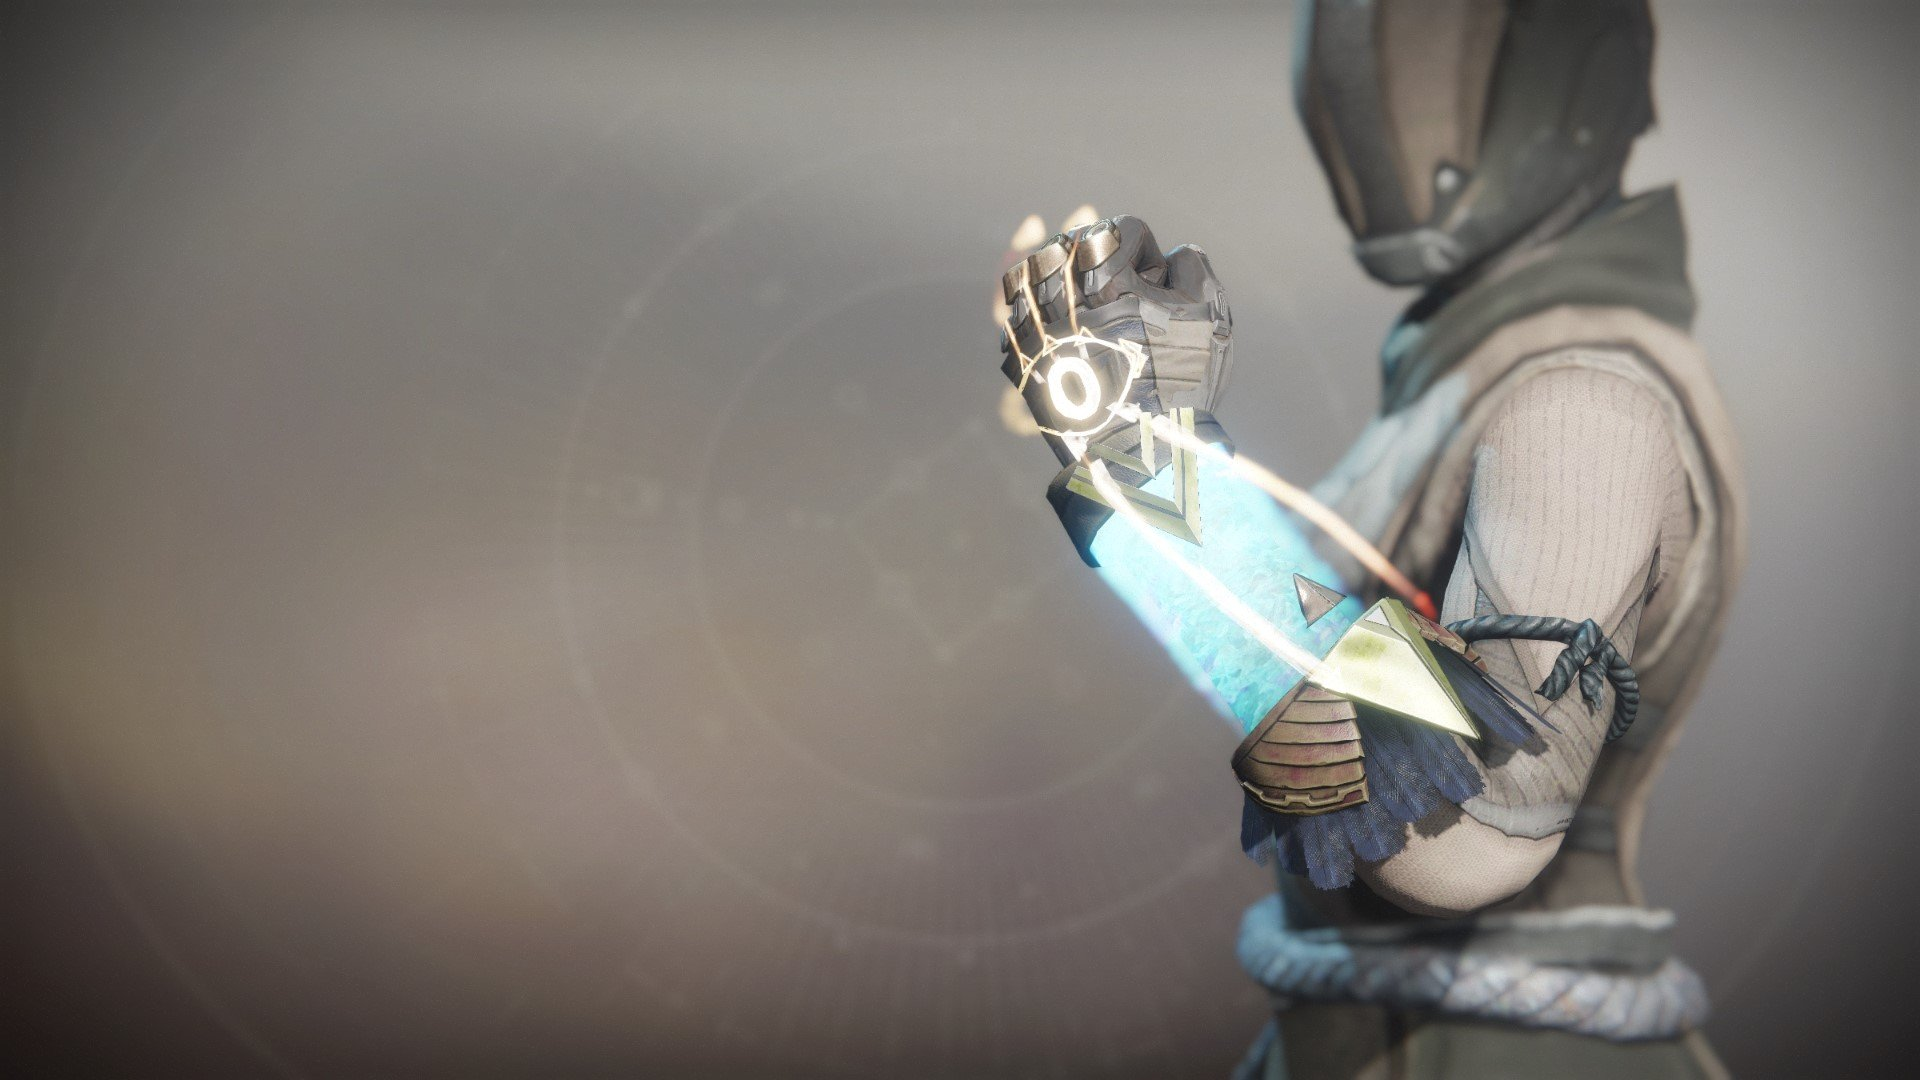 An in-game render of the Eyes of Mercury.